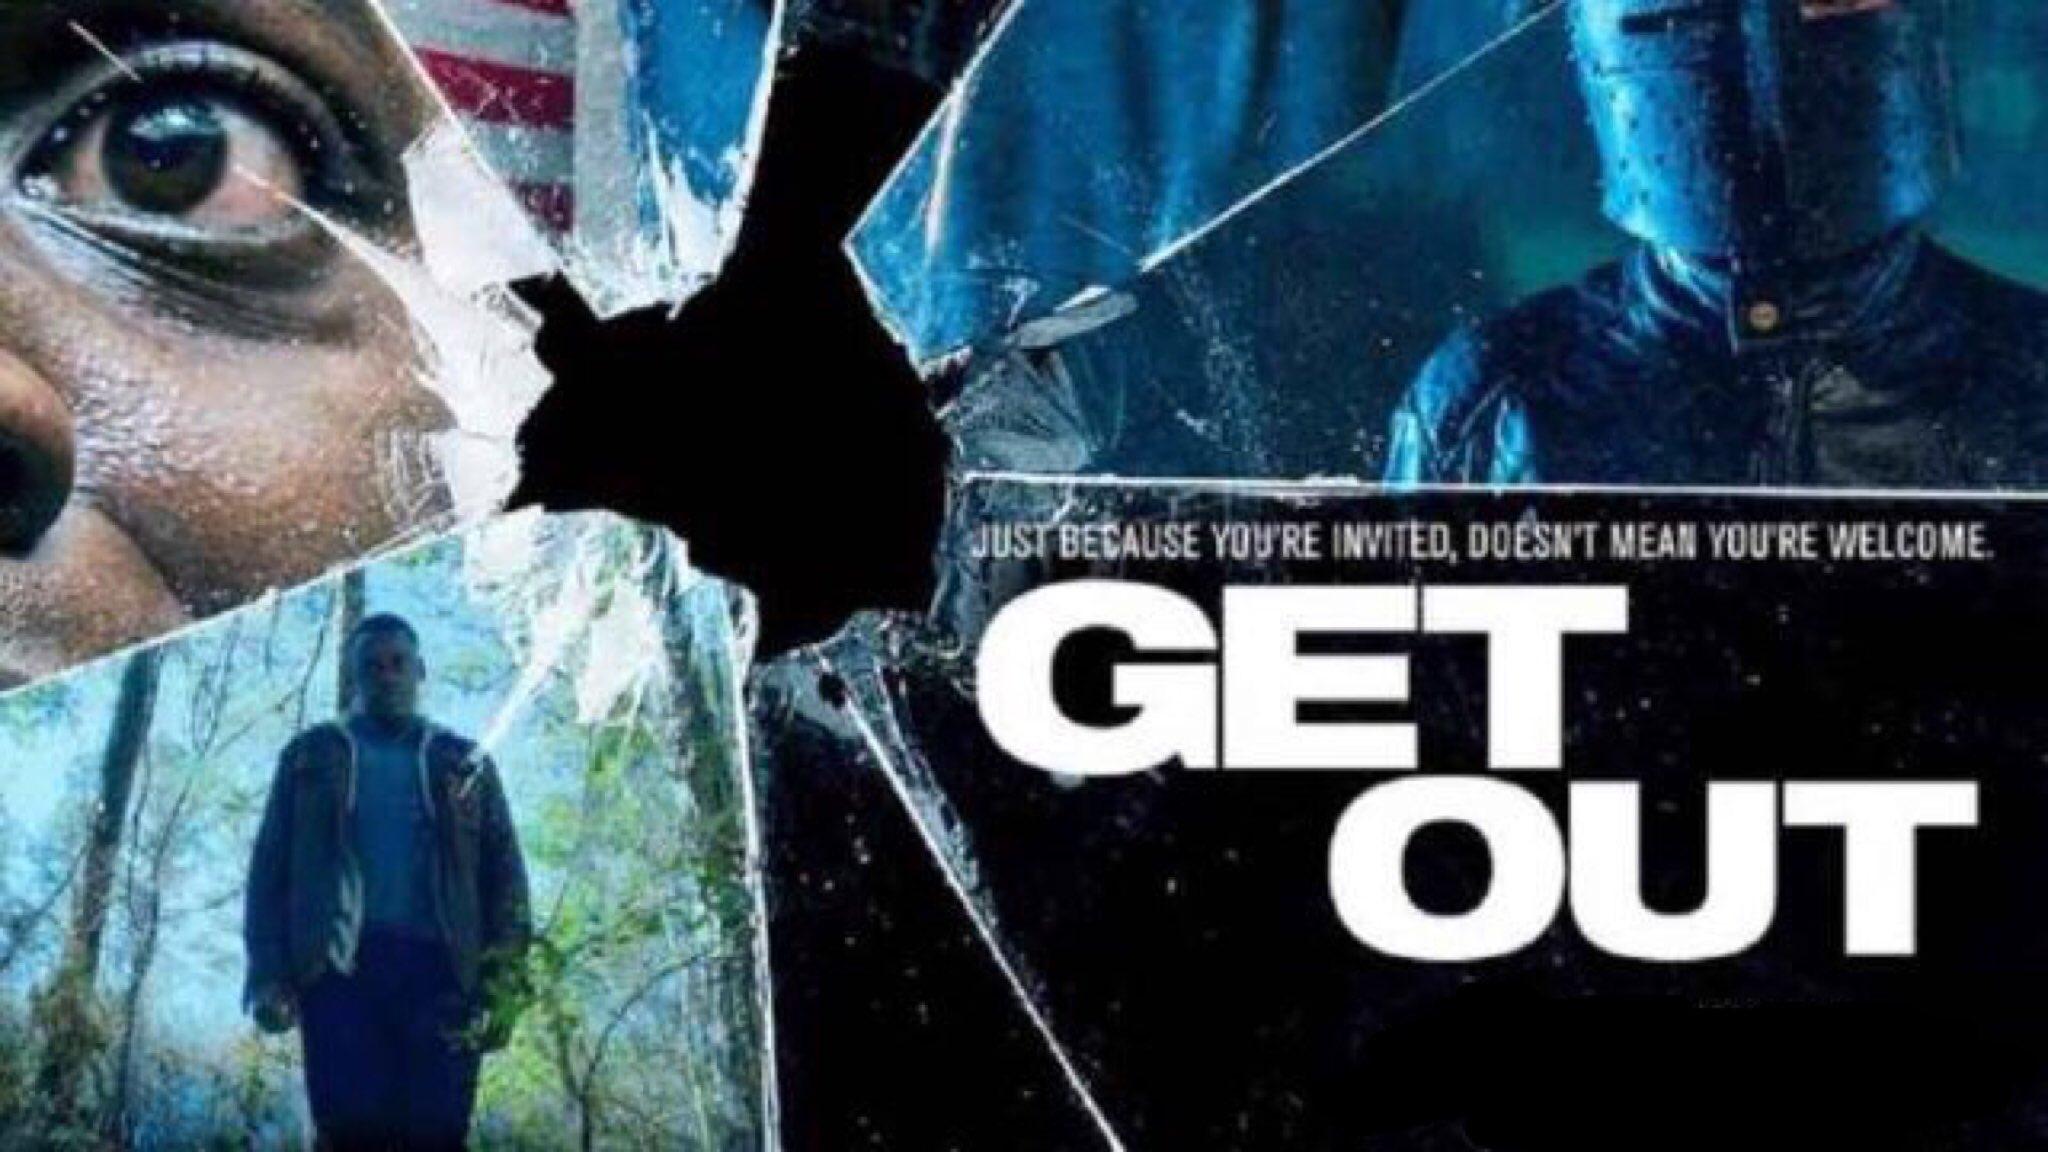 @DankwaBrooks Here we go! #GetOut Feature Commentary with Writer/Director JORDAN PEELE https://t.co/jXfGlMIP1b